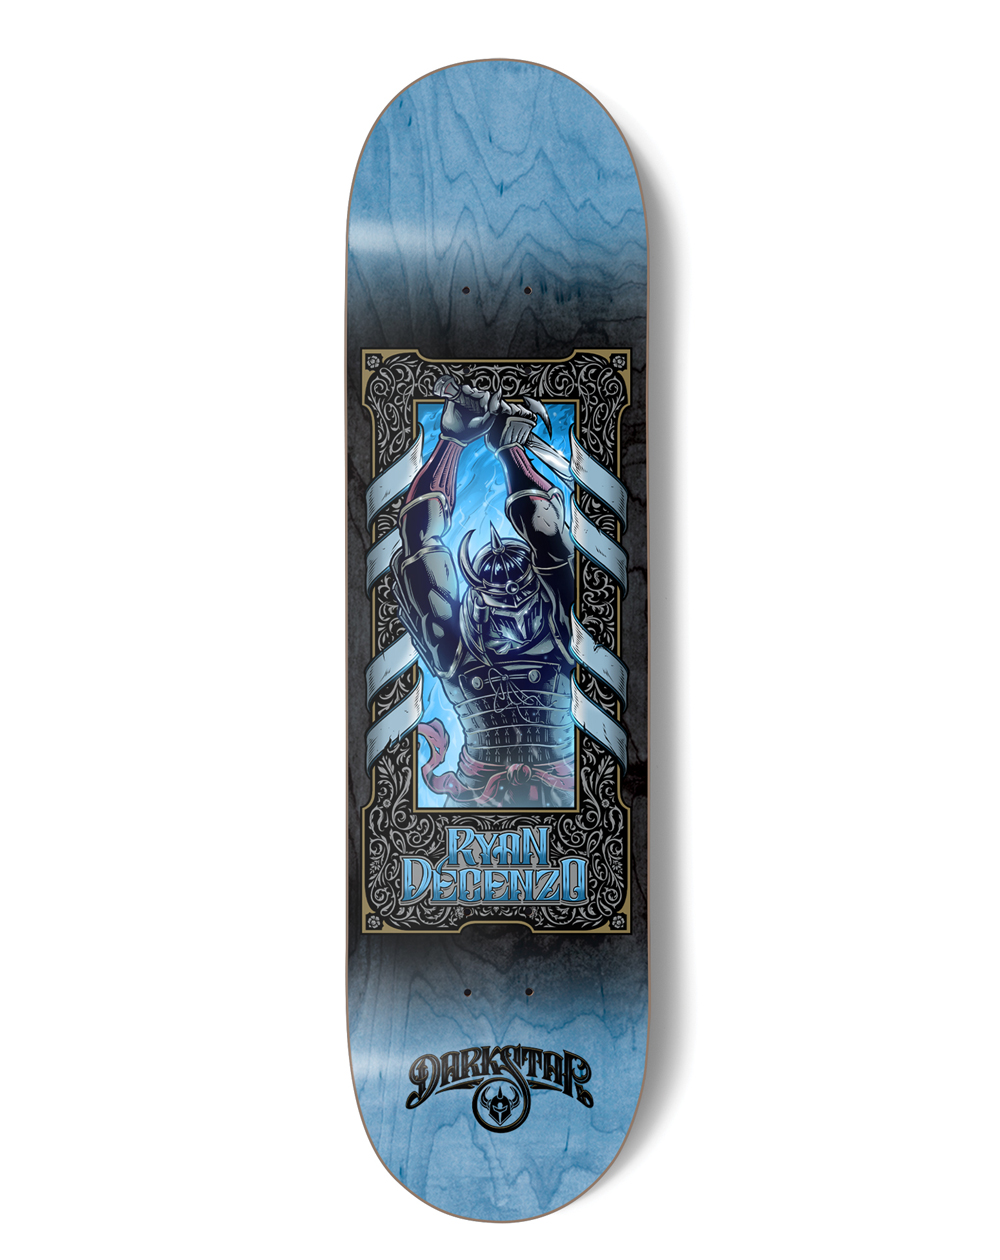 "Darkstar Tavola Skateboard Anthology Decenzo 8.375"""